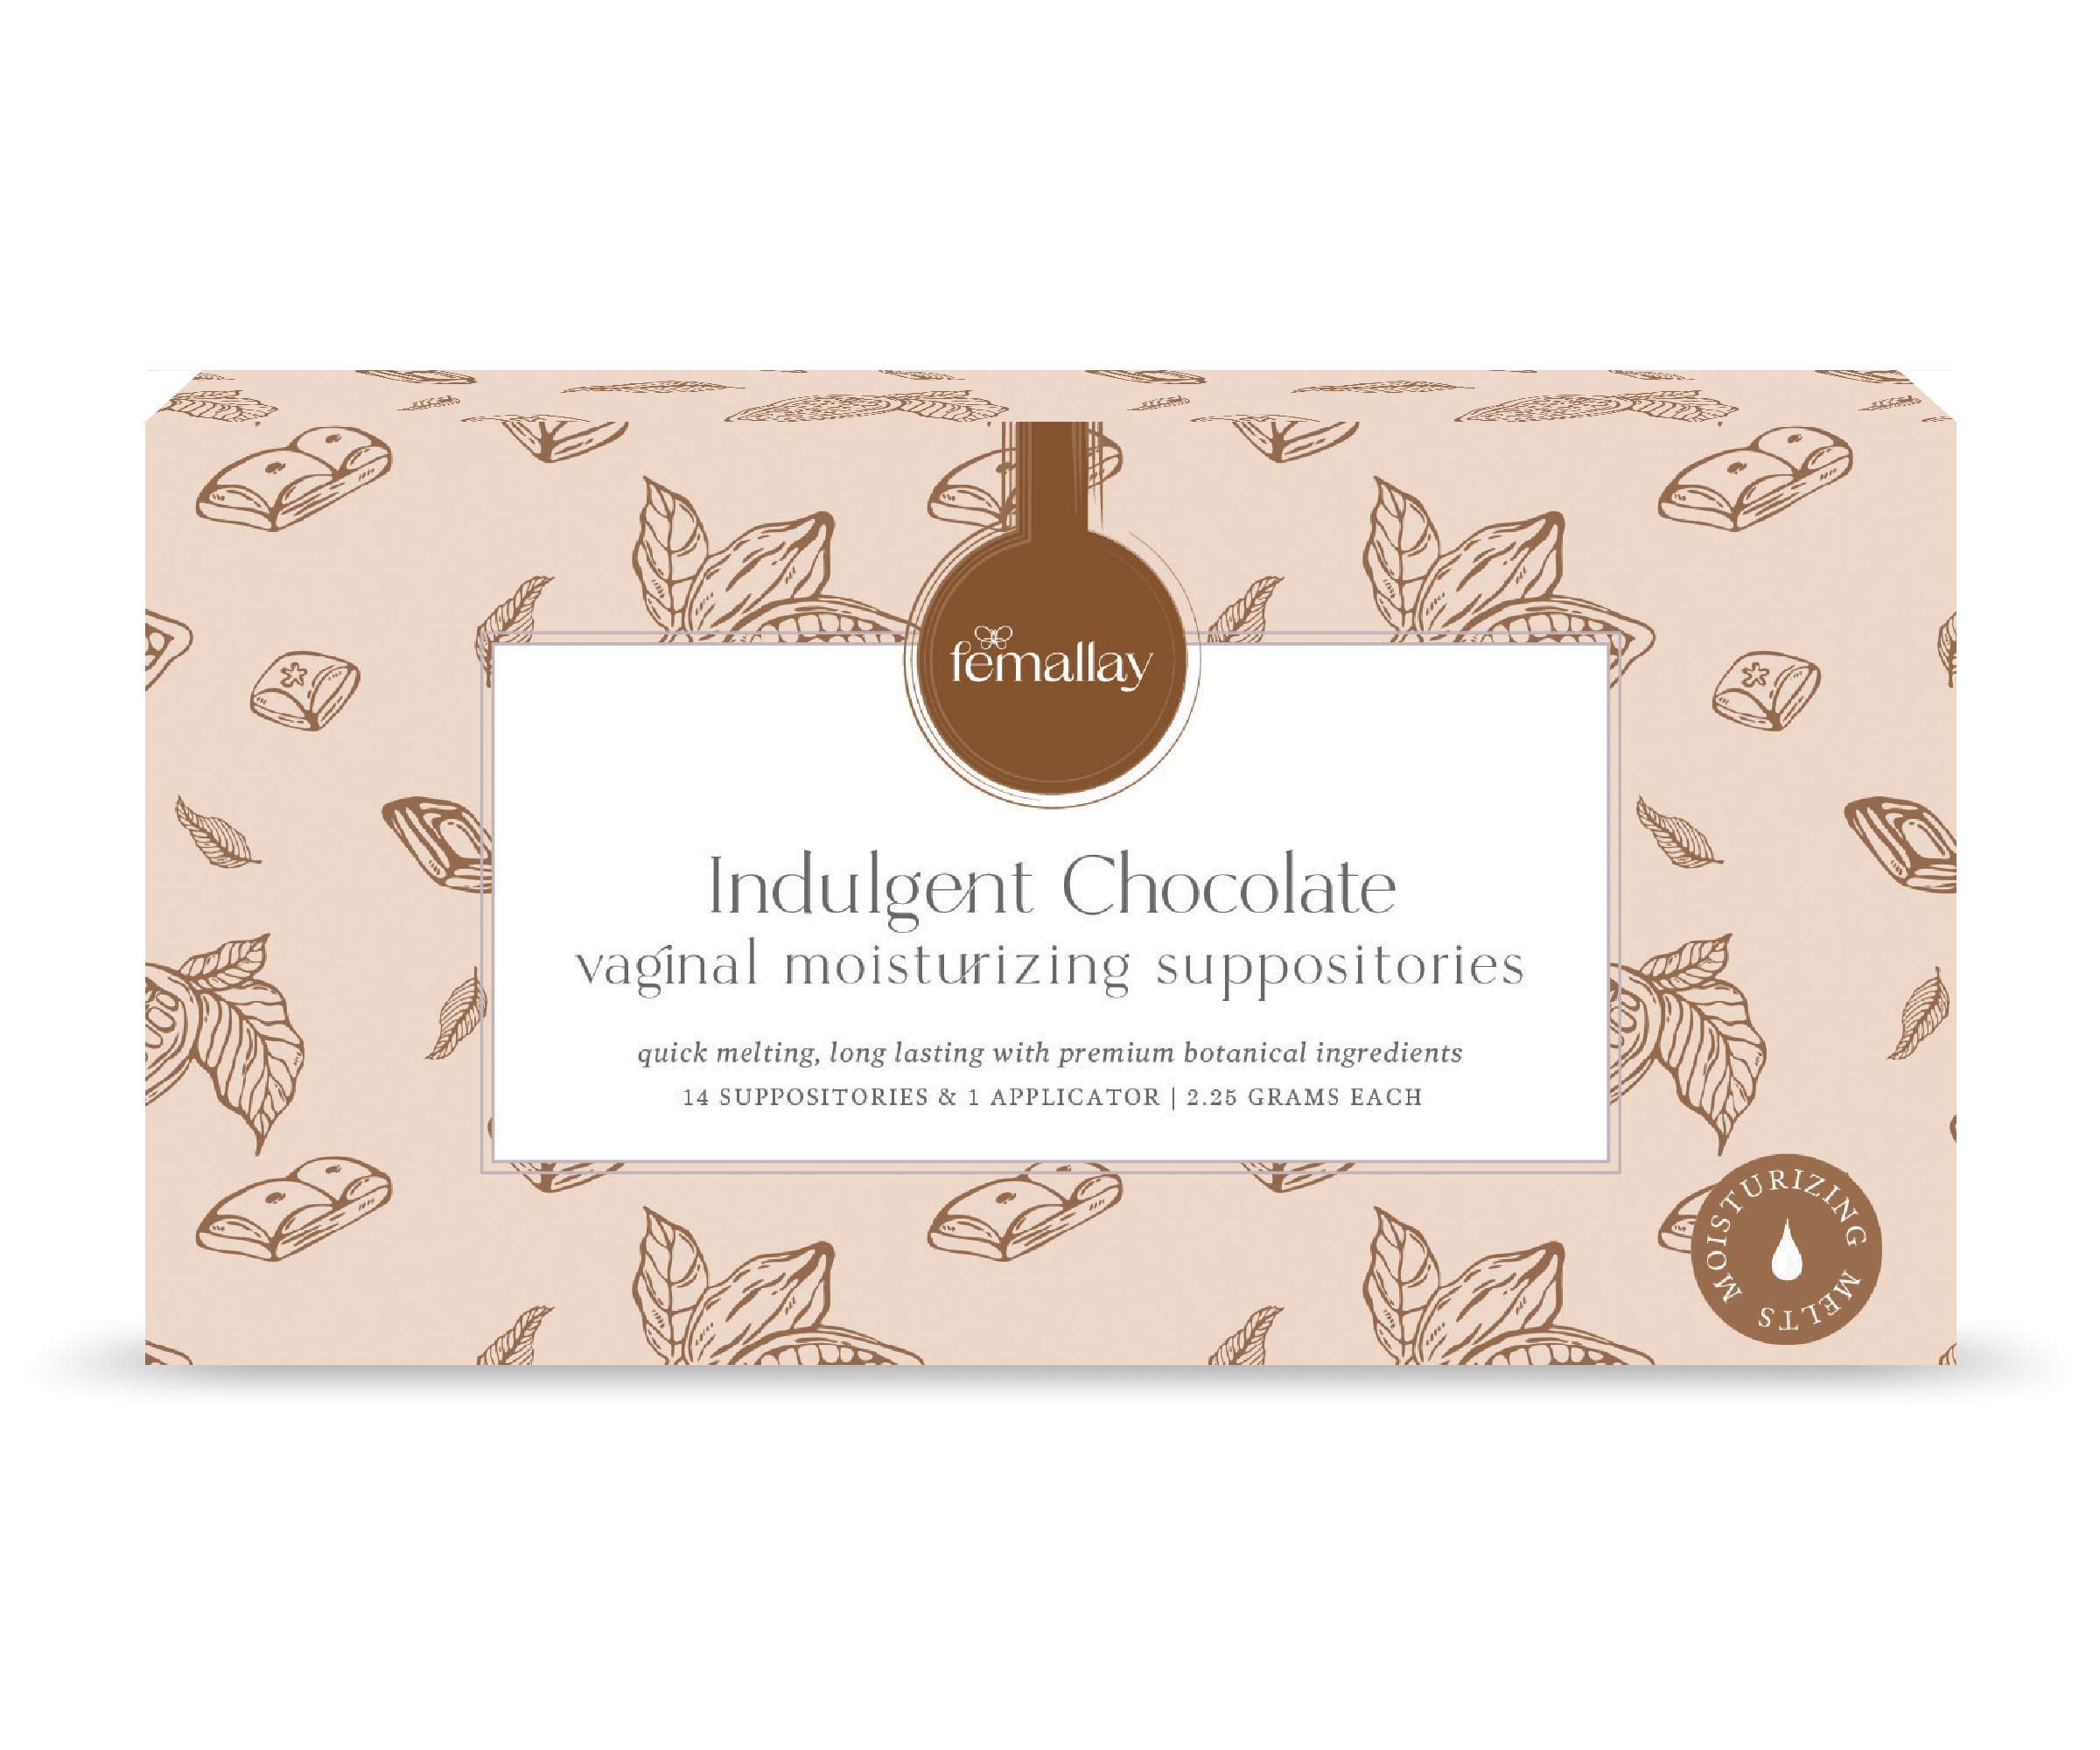 Femallay Organic Indulgent Chocolate Vaginal Moisturizing Suppository Melts – 14 Individually Sealed Suppositories + 1 applicator